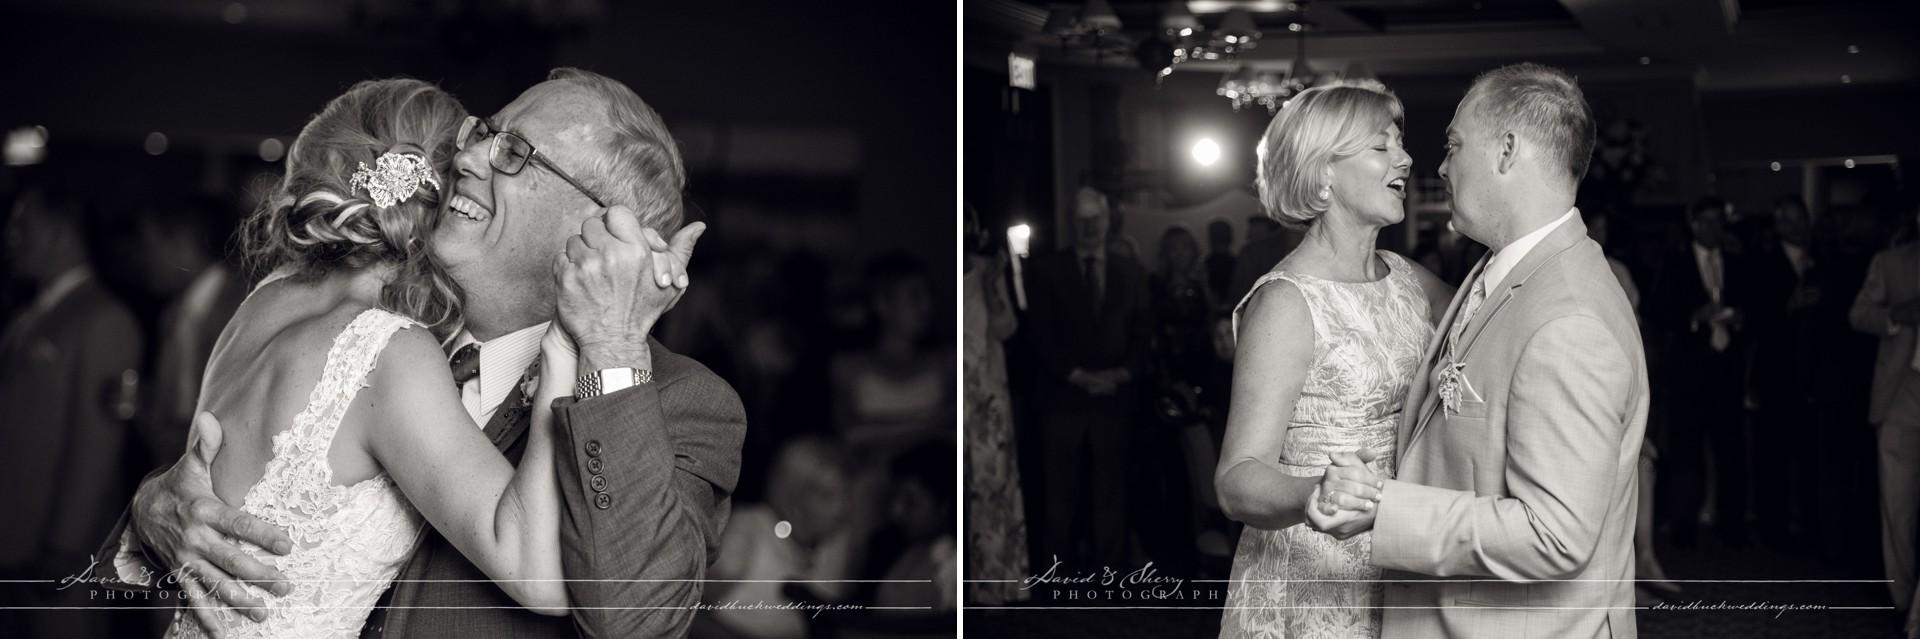 Cobble_Beach_Wedding_Photography_Owen_Sound_43